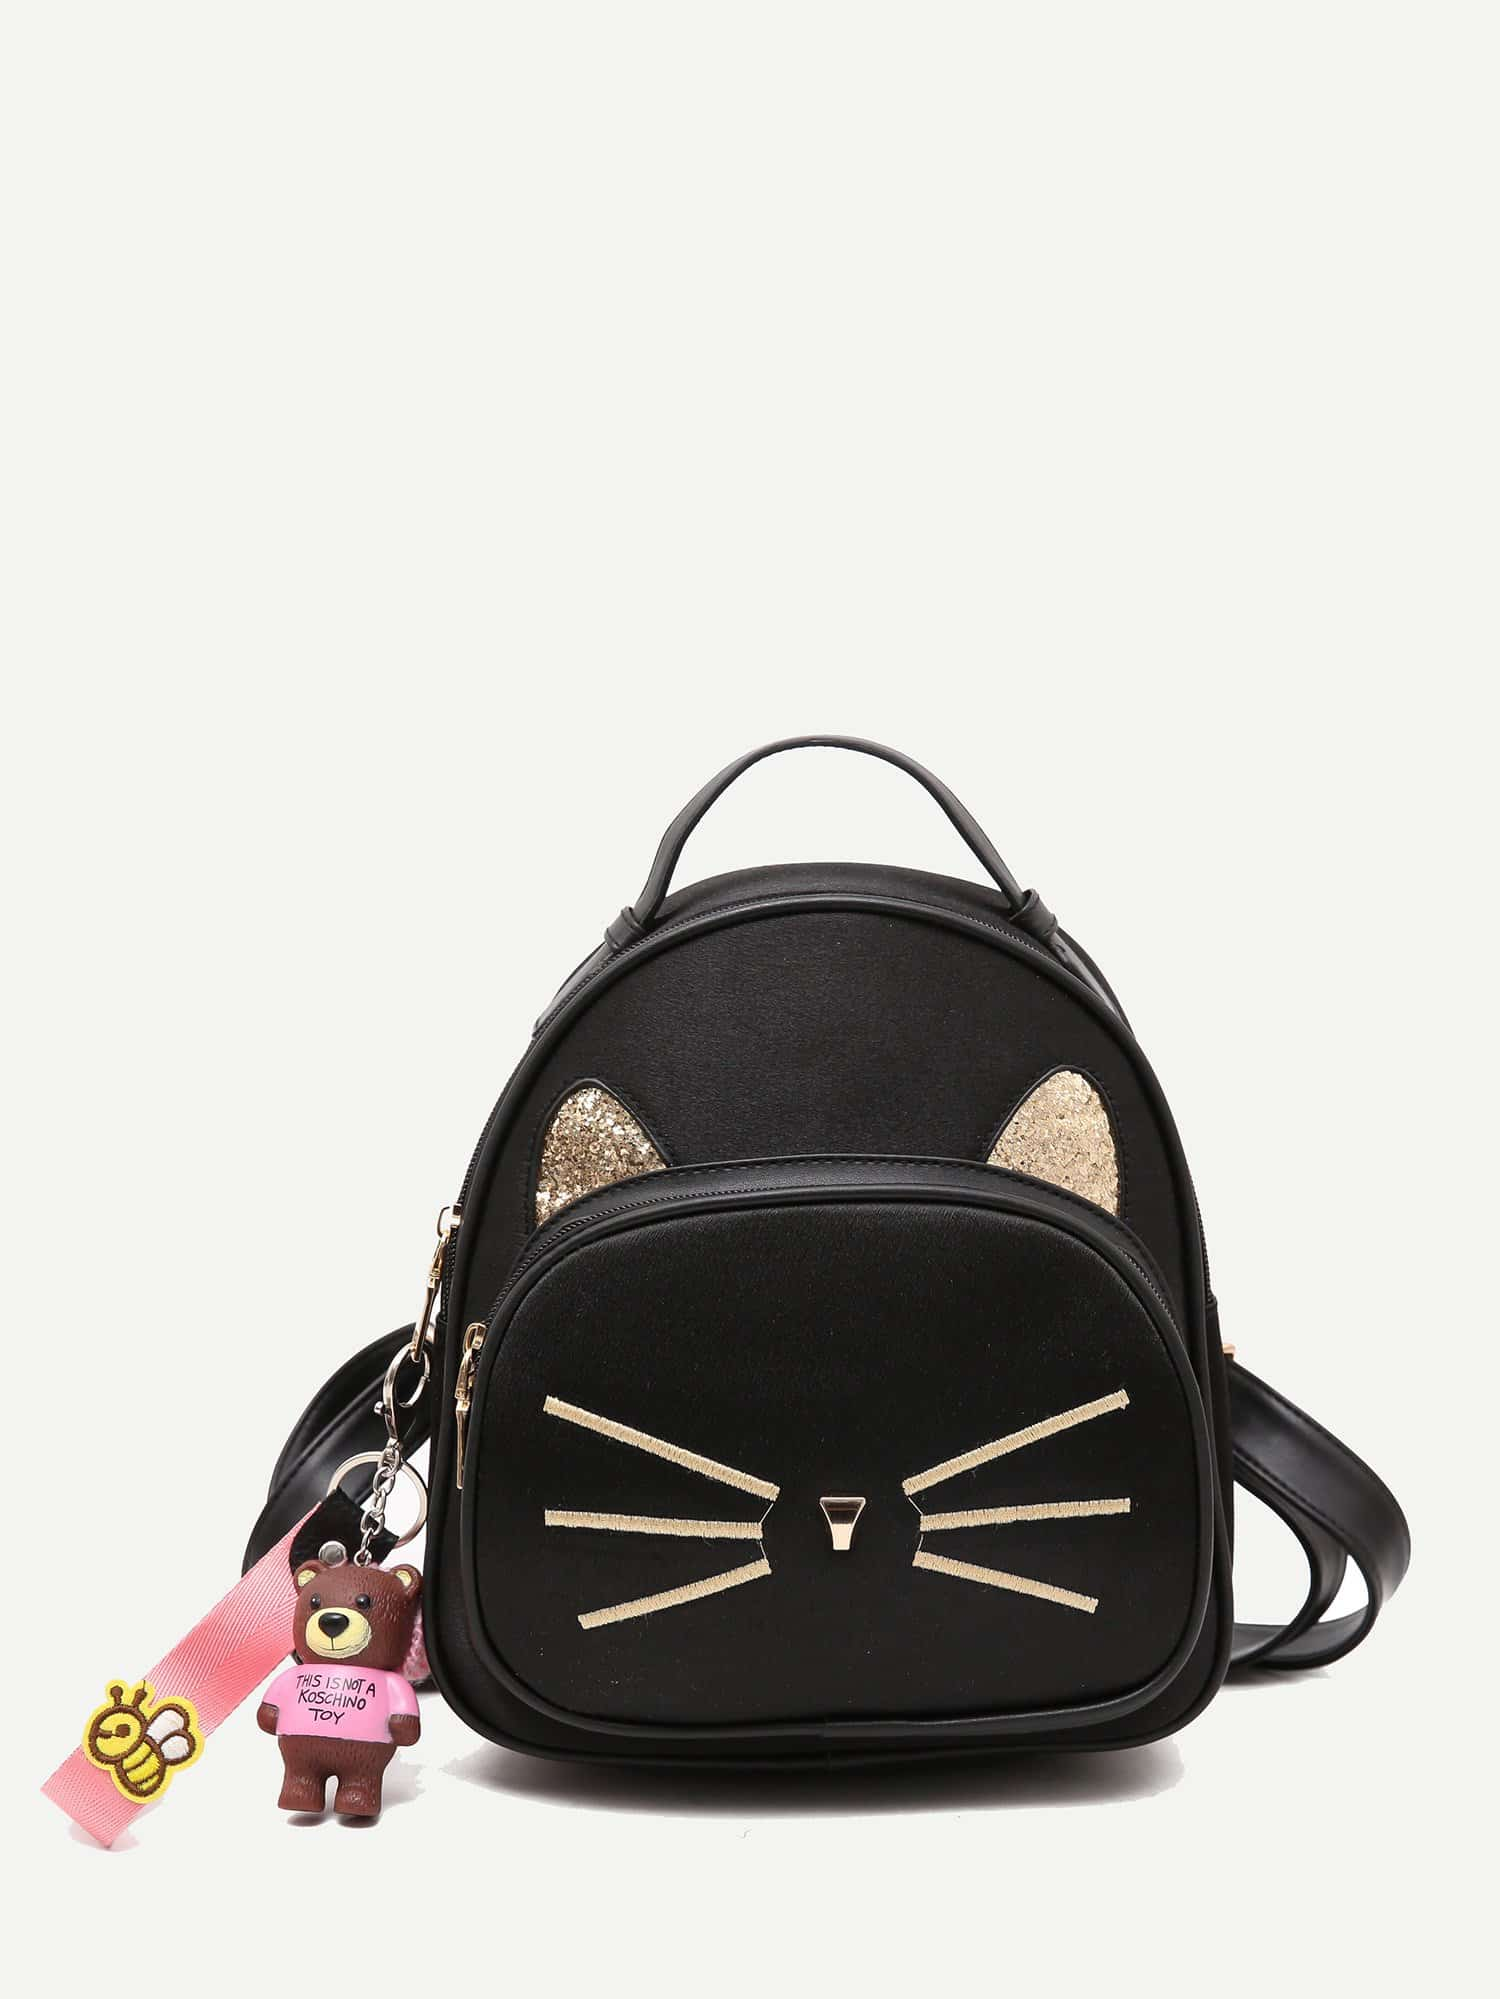 Cartoon Embroidered Backpack With Charm cartoon charm hair clip 6pcs